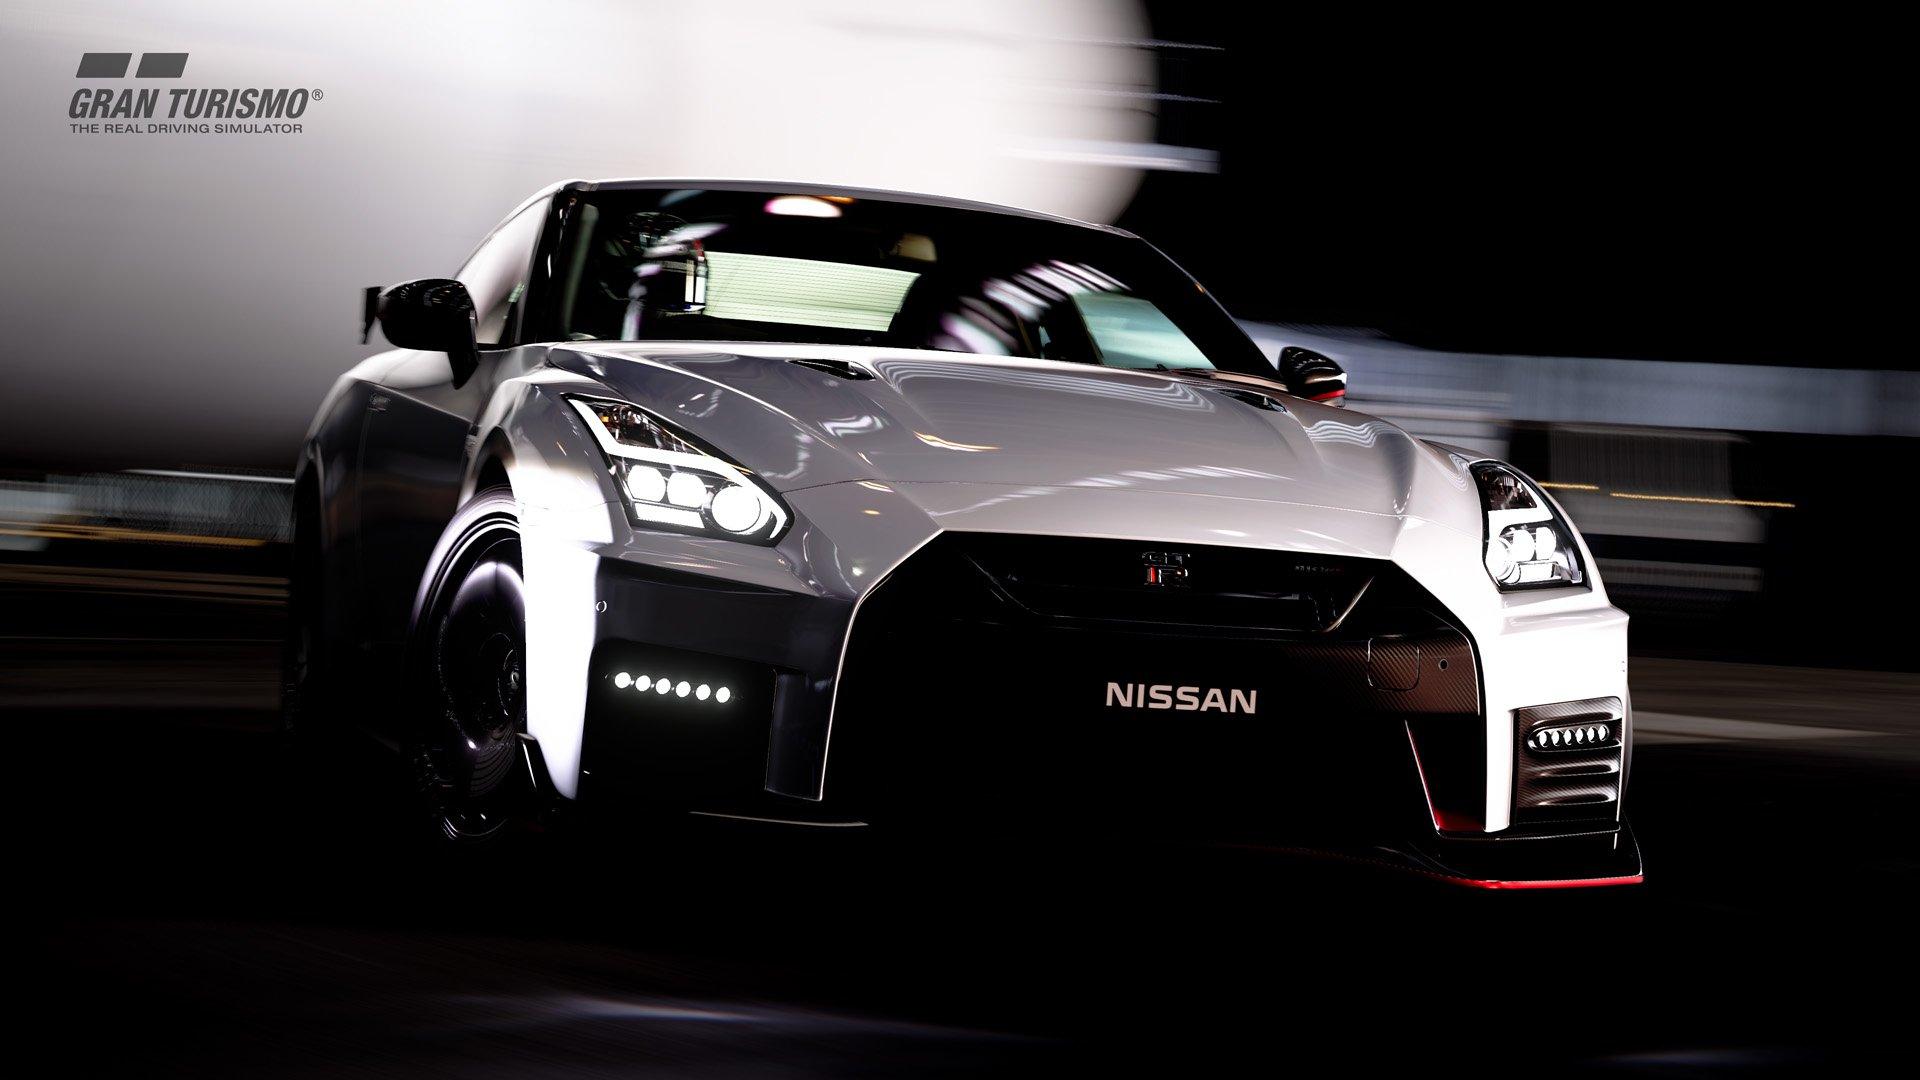 Gran Turismo Sport version 1.15 Nissan GT-R NISMO '17 (N600) 2